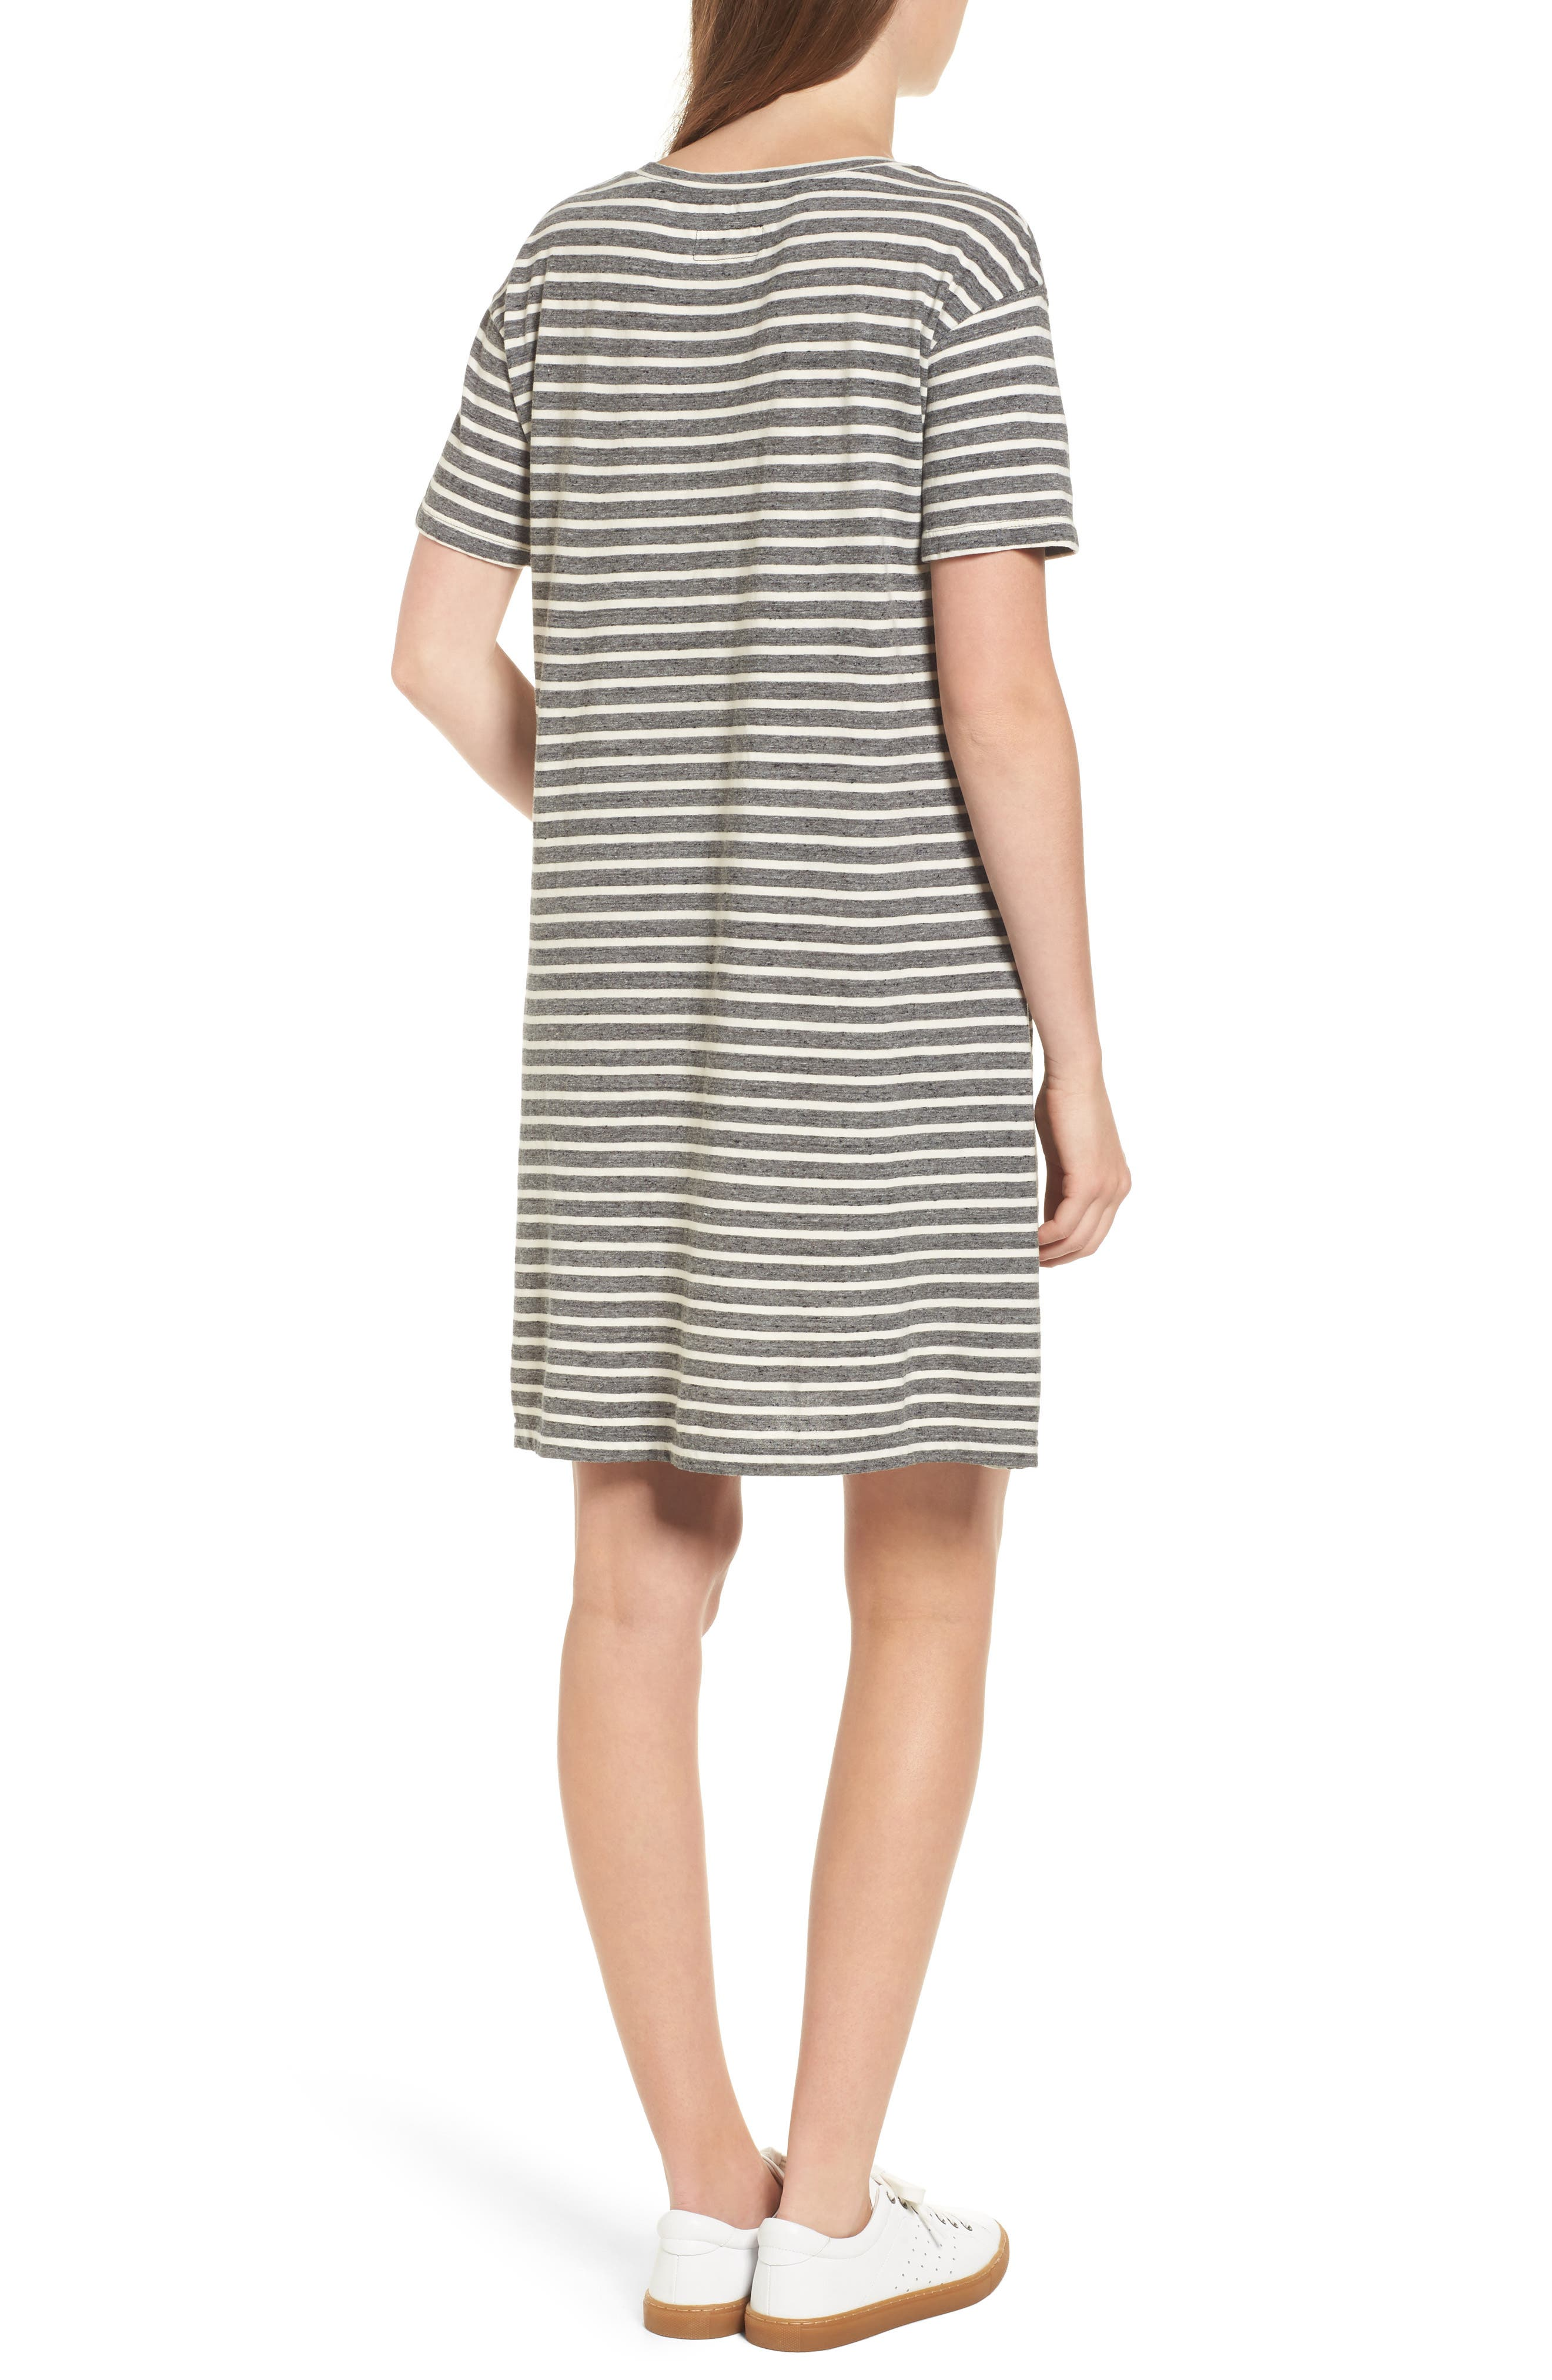 Stripe Knit T-Shirt Dress,                             Alternate thumbnail 2, color,                             Charcoal Anchor Stripe